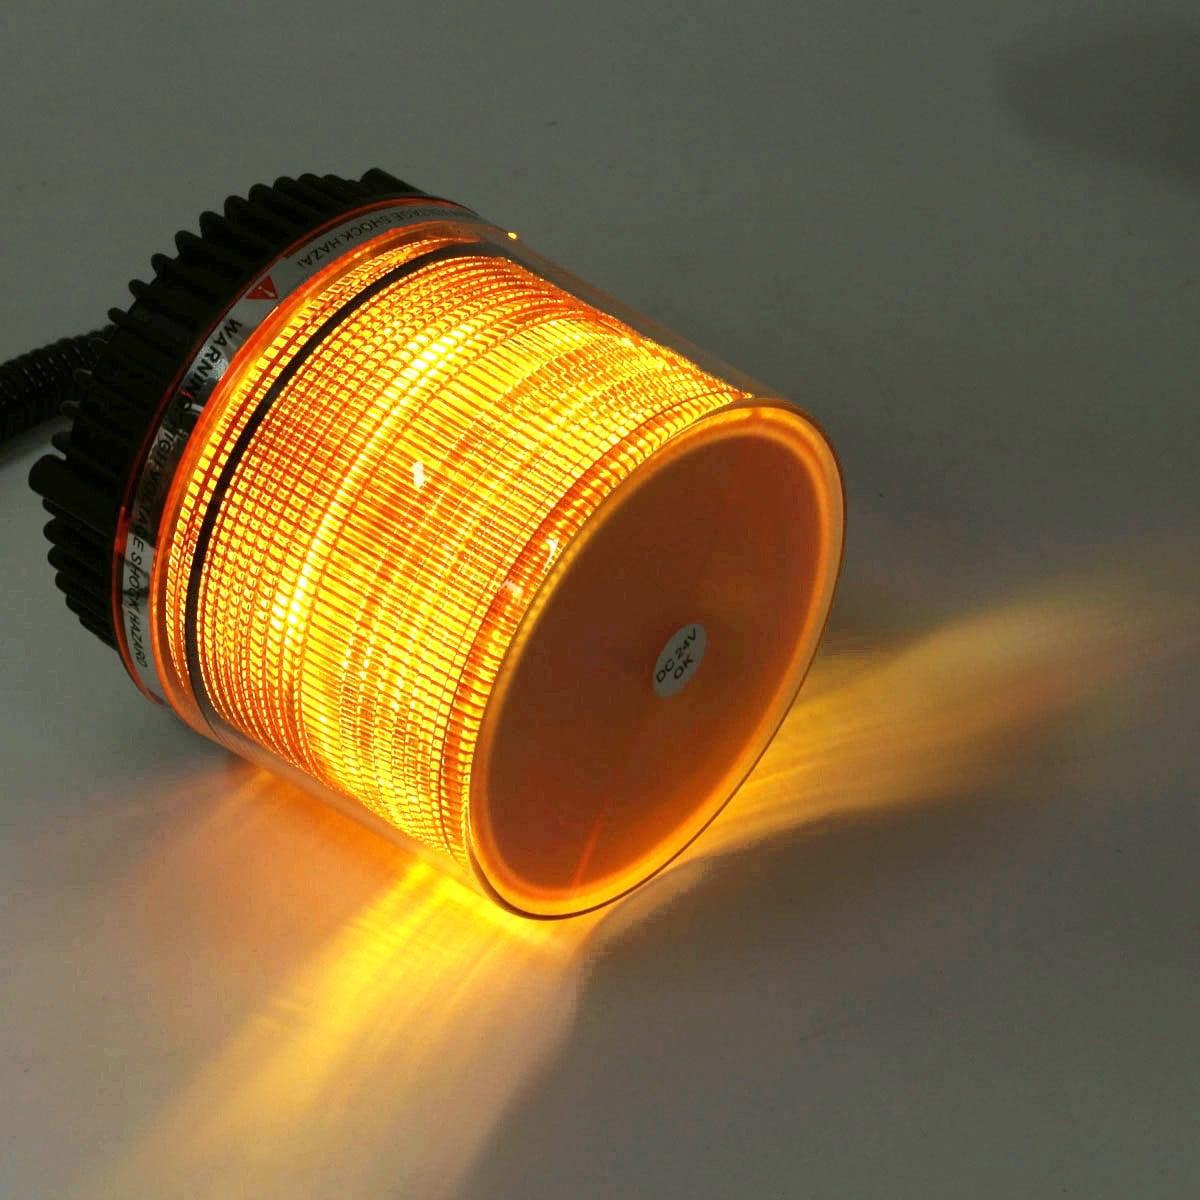 RED Stud Infinite Innovations UL114001 Trailer Light